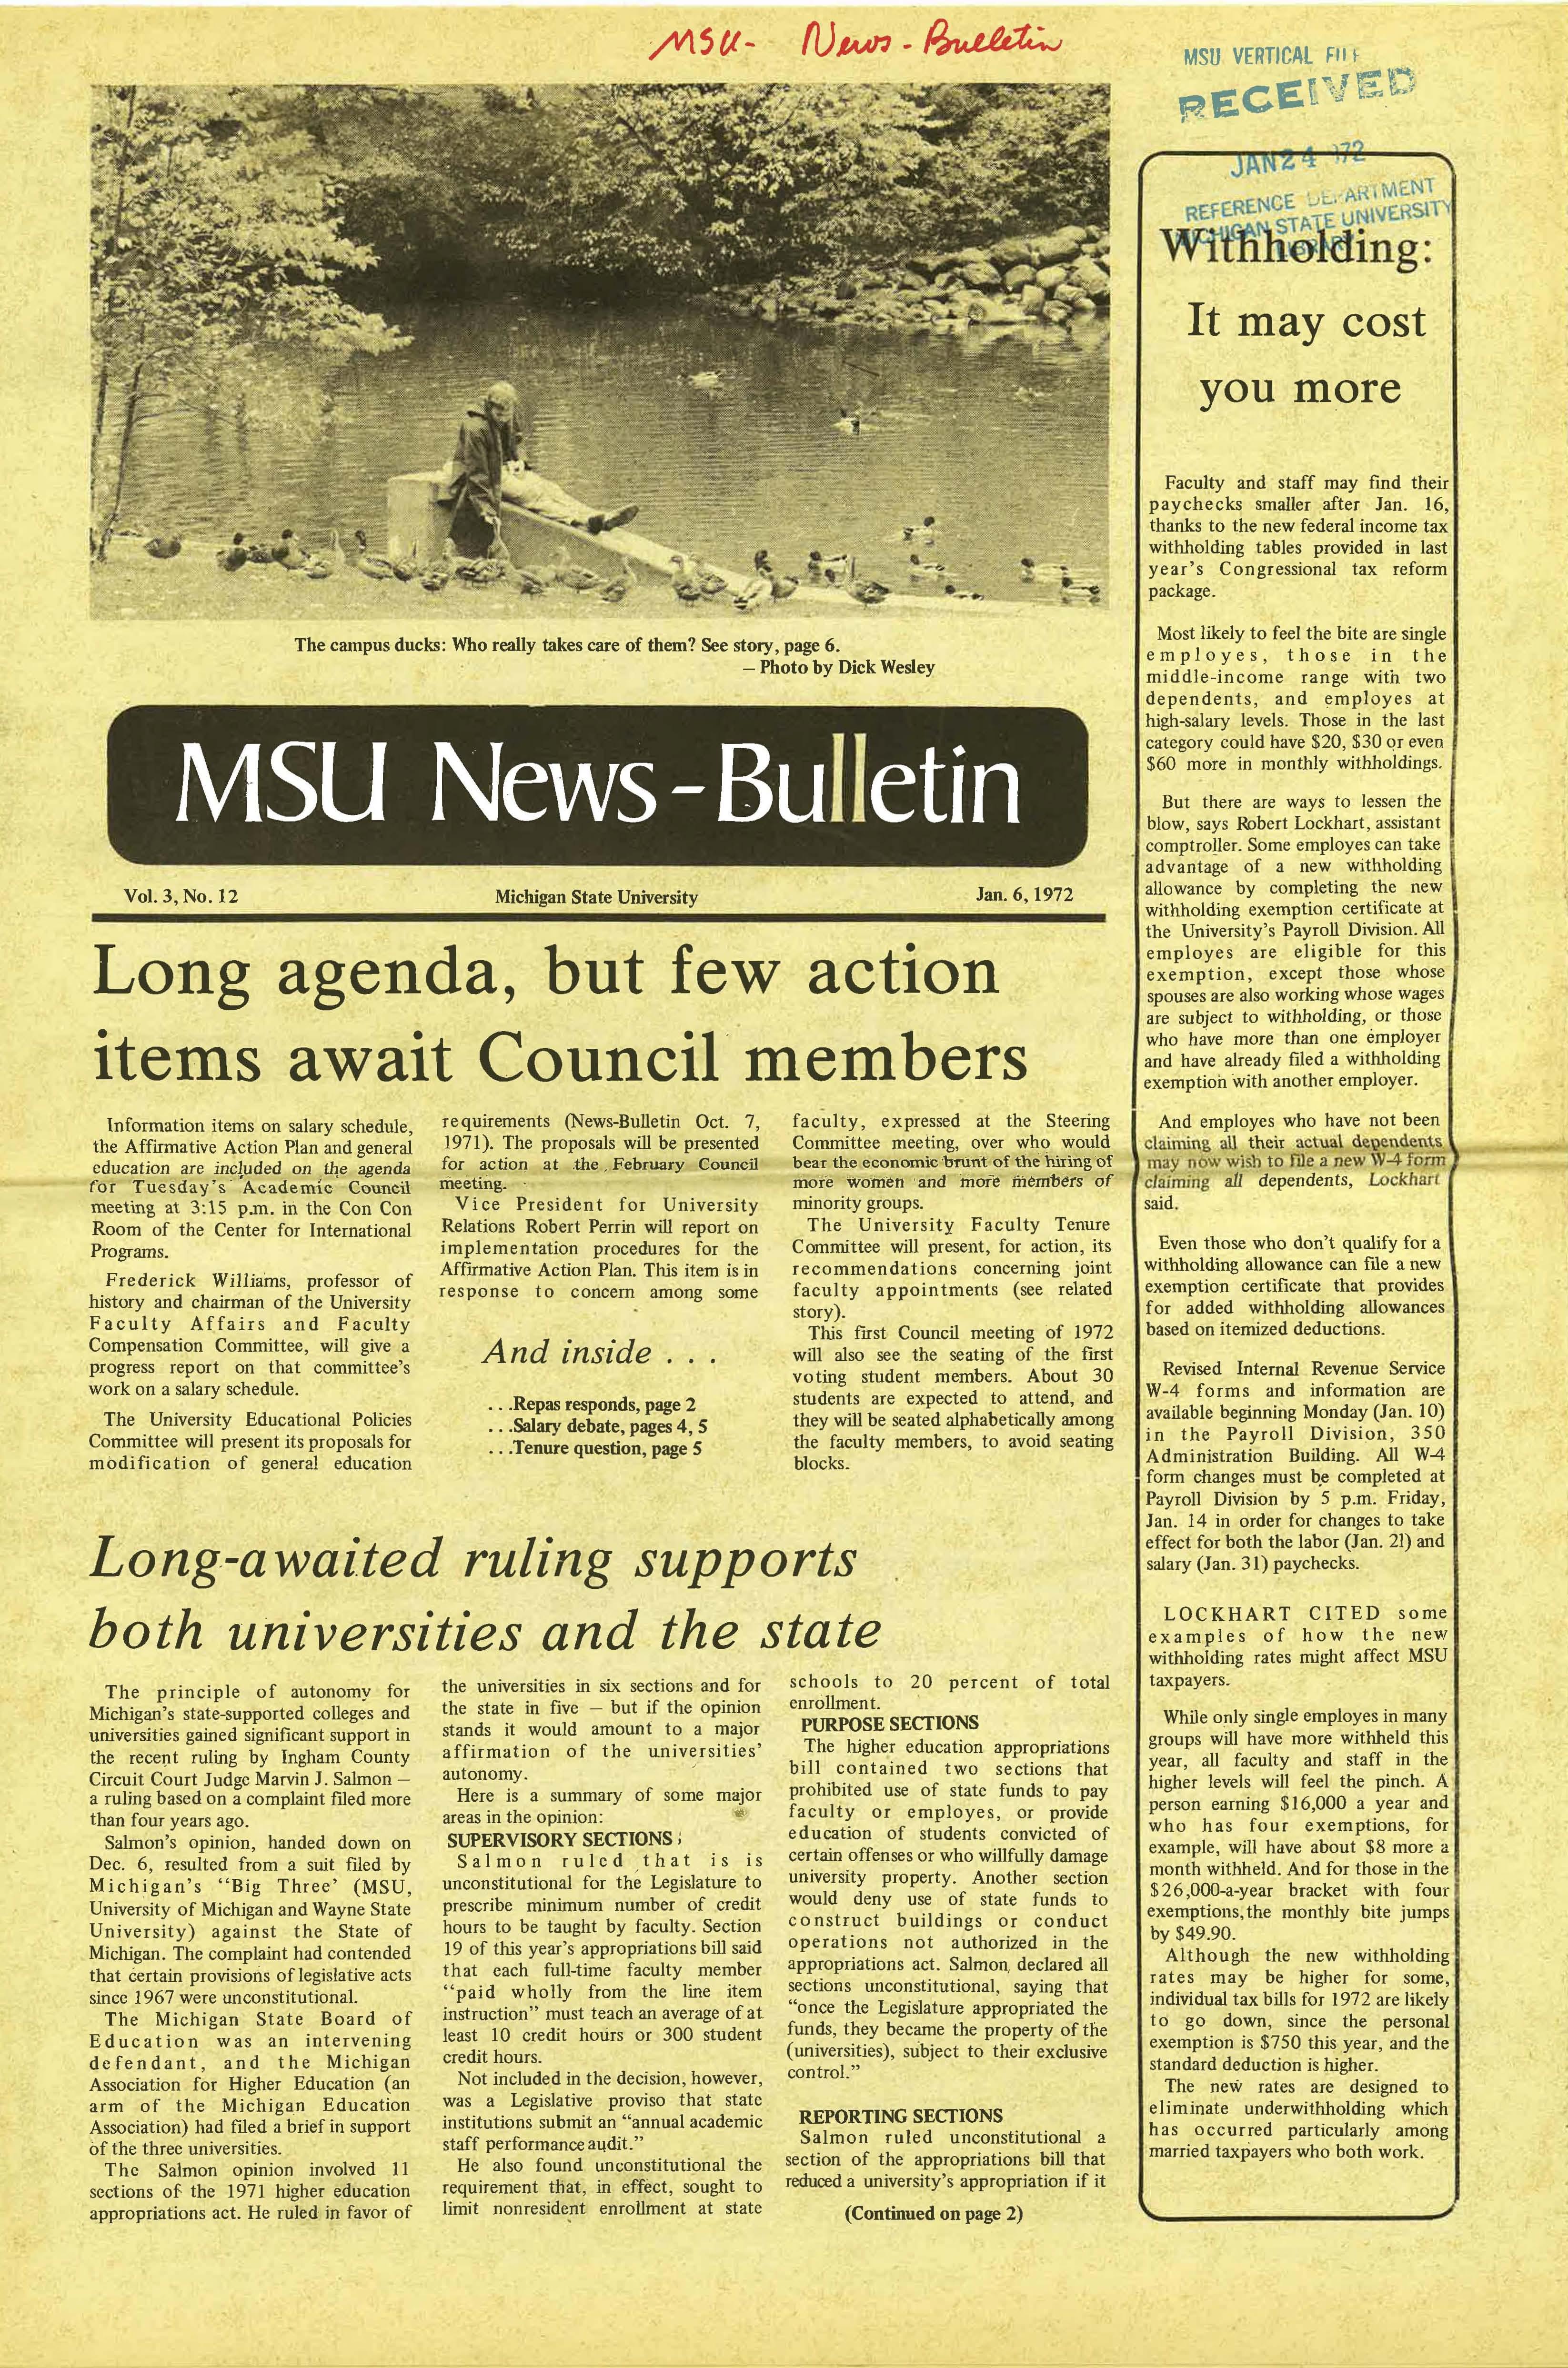 MSU News Bulletin, vol. 3, No. 13, January 13, 1972